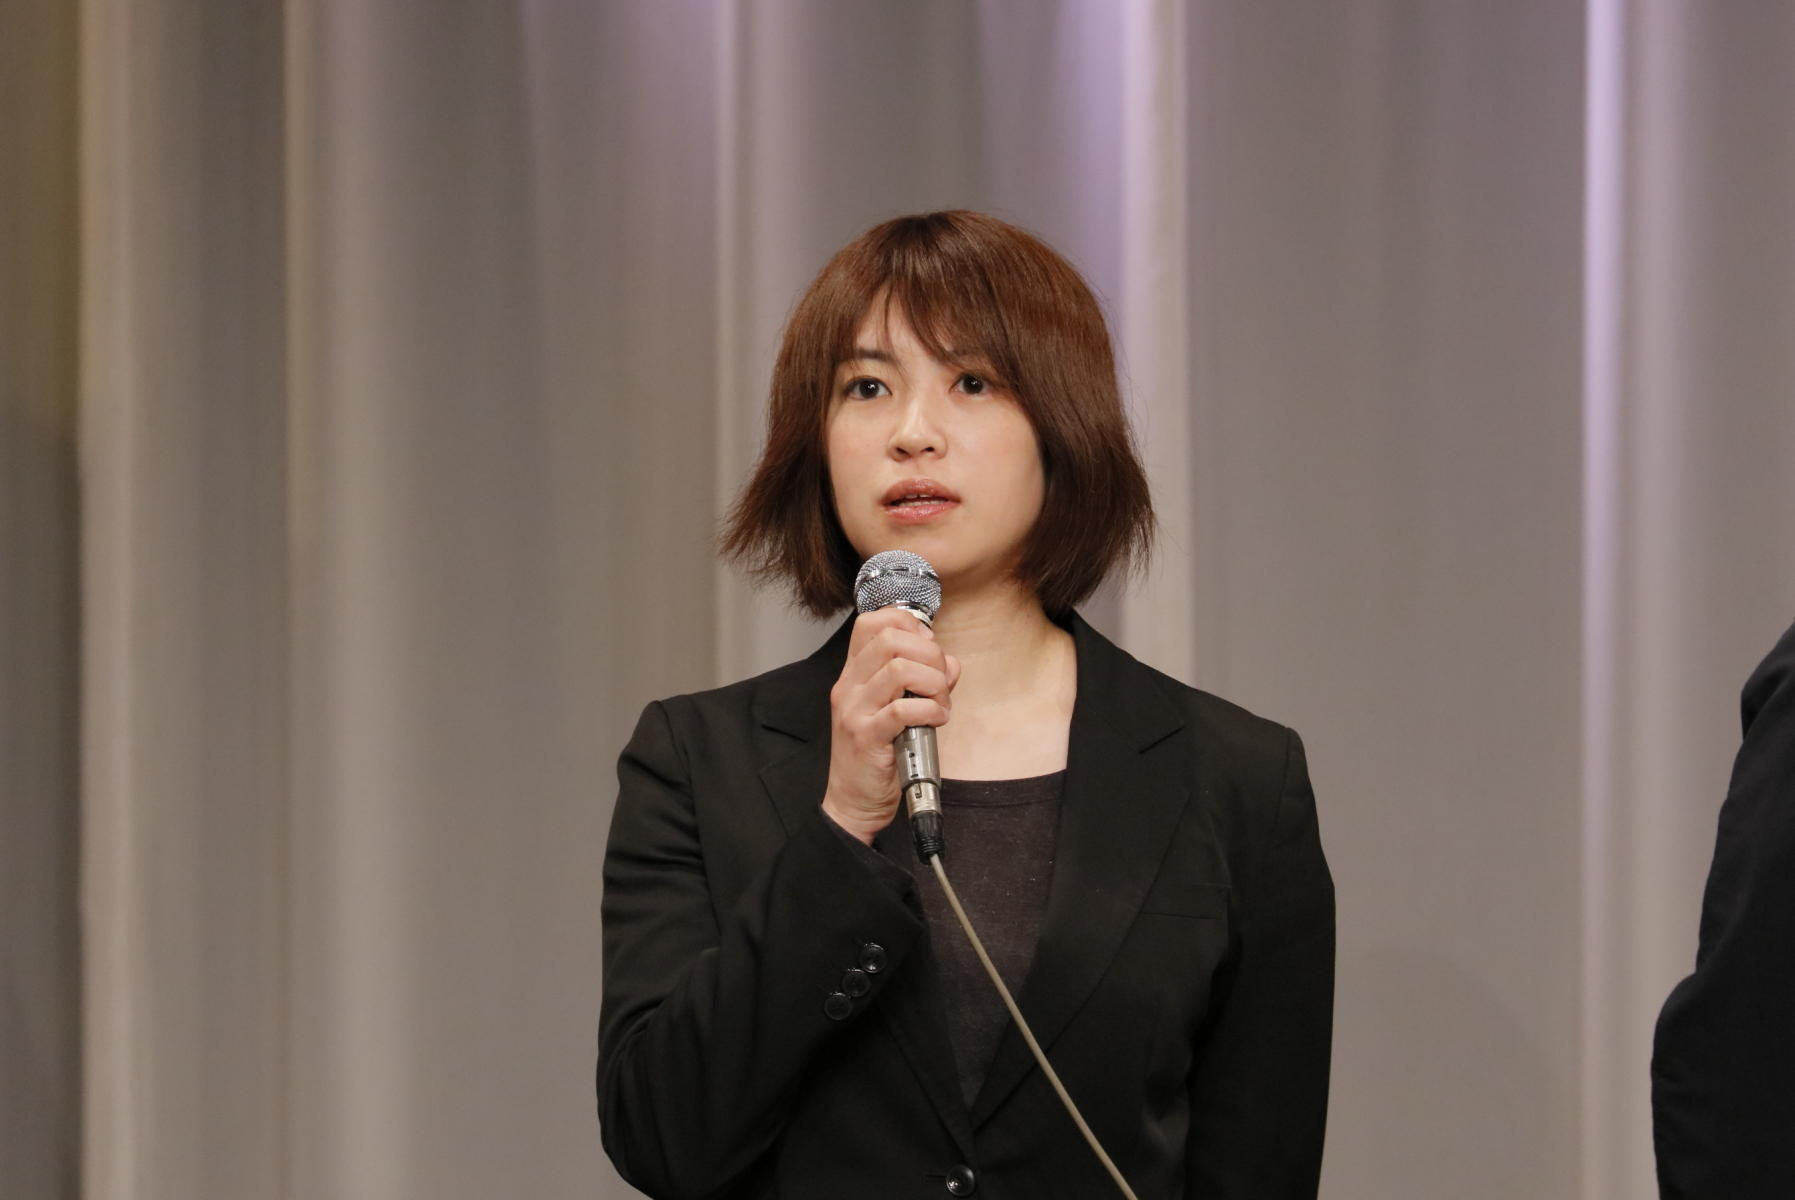 http://news.yoshimoto.co.jp/20180314164309-977438ad94433d8fd09e7da5ed9bbedc2abb9c43.jpg